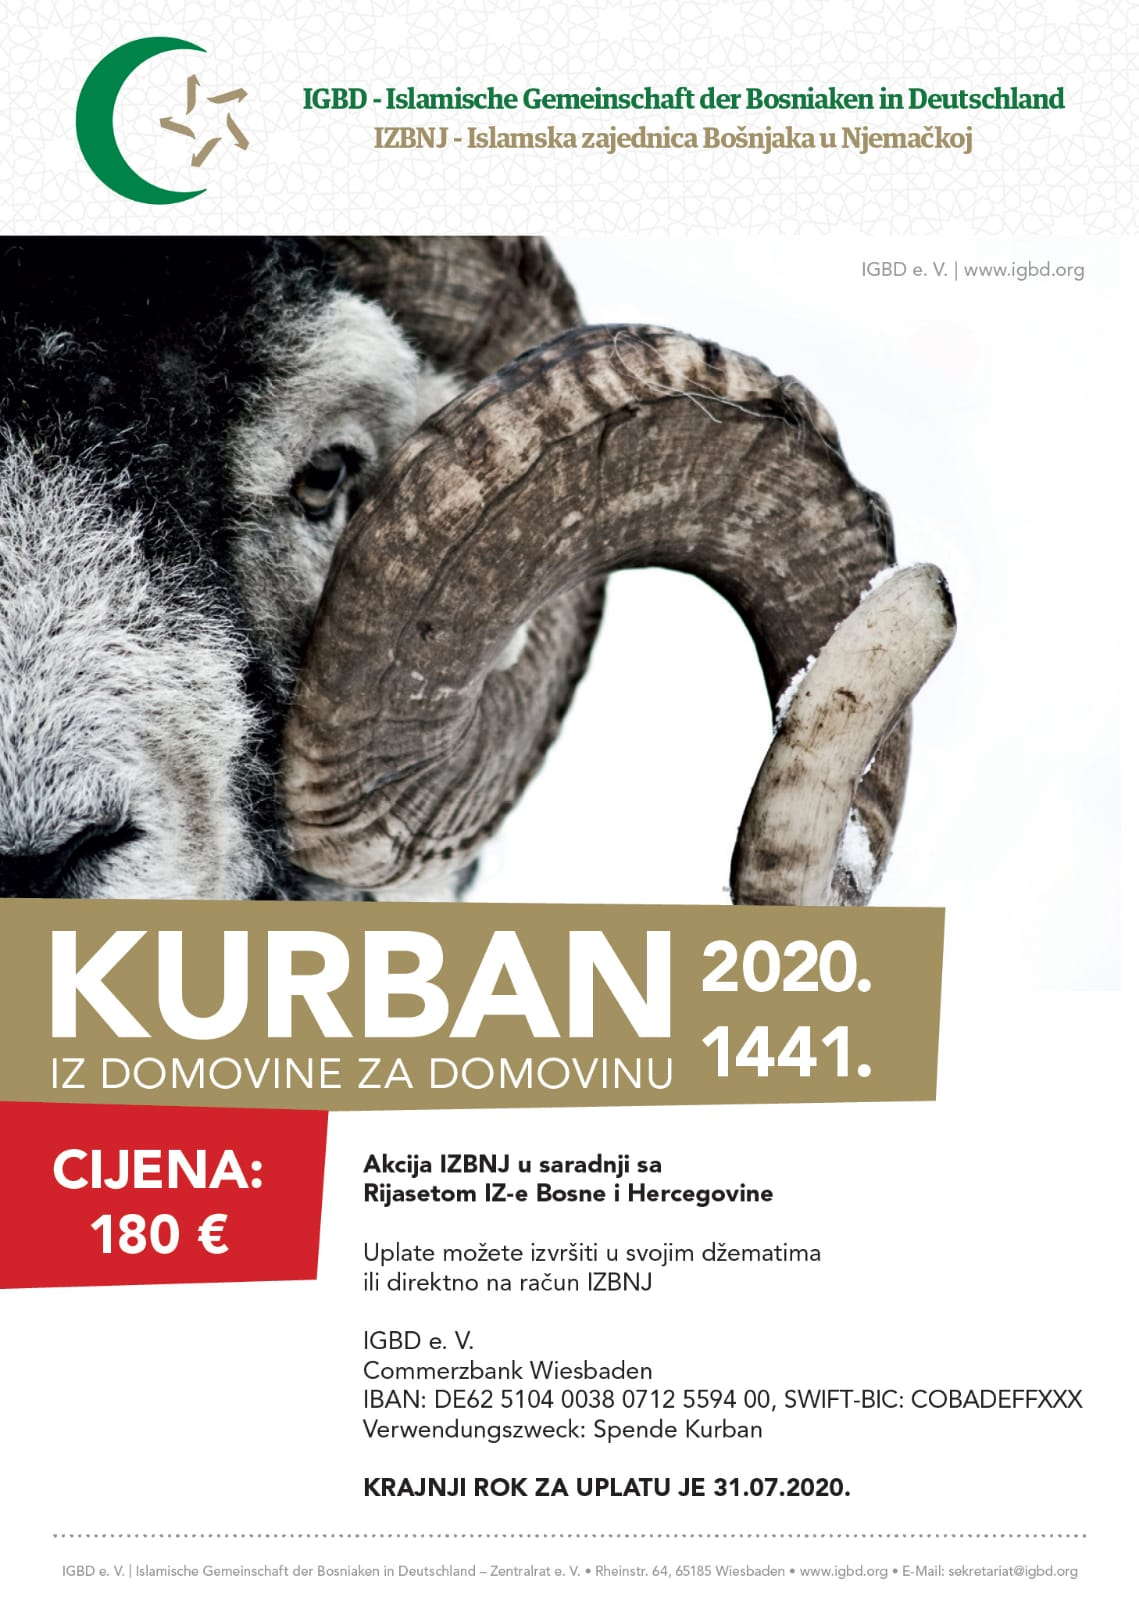 Kurban 2020